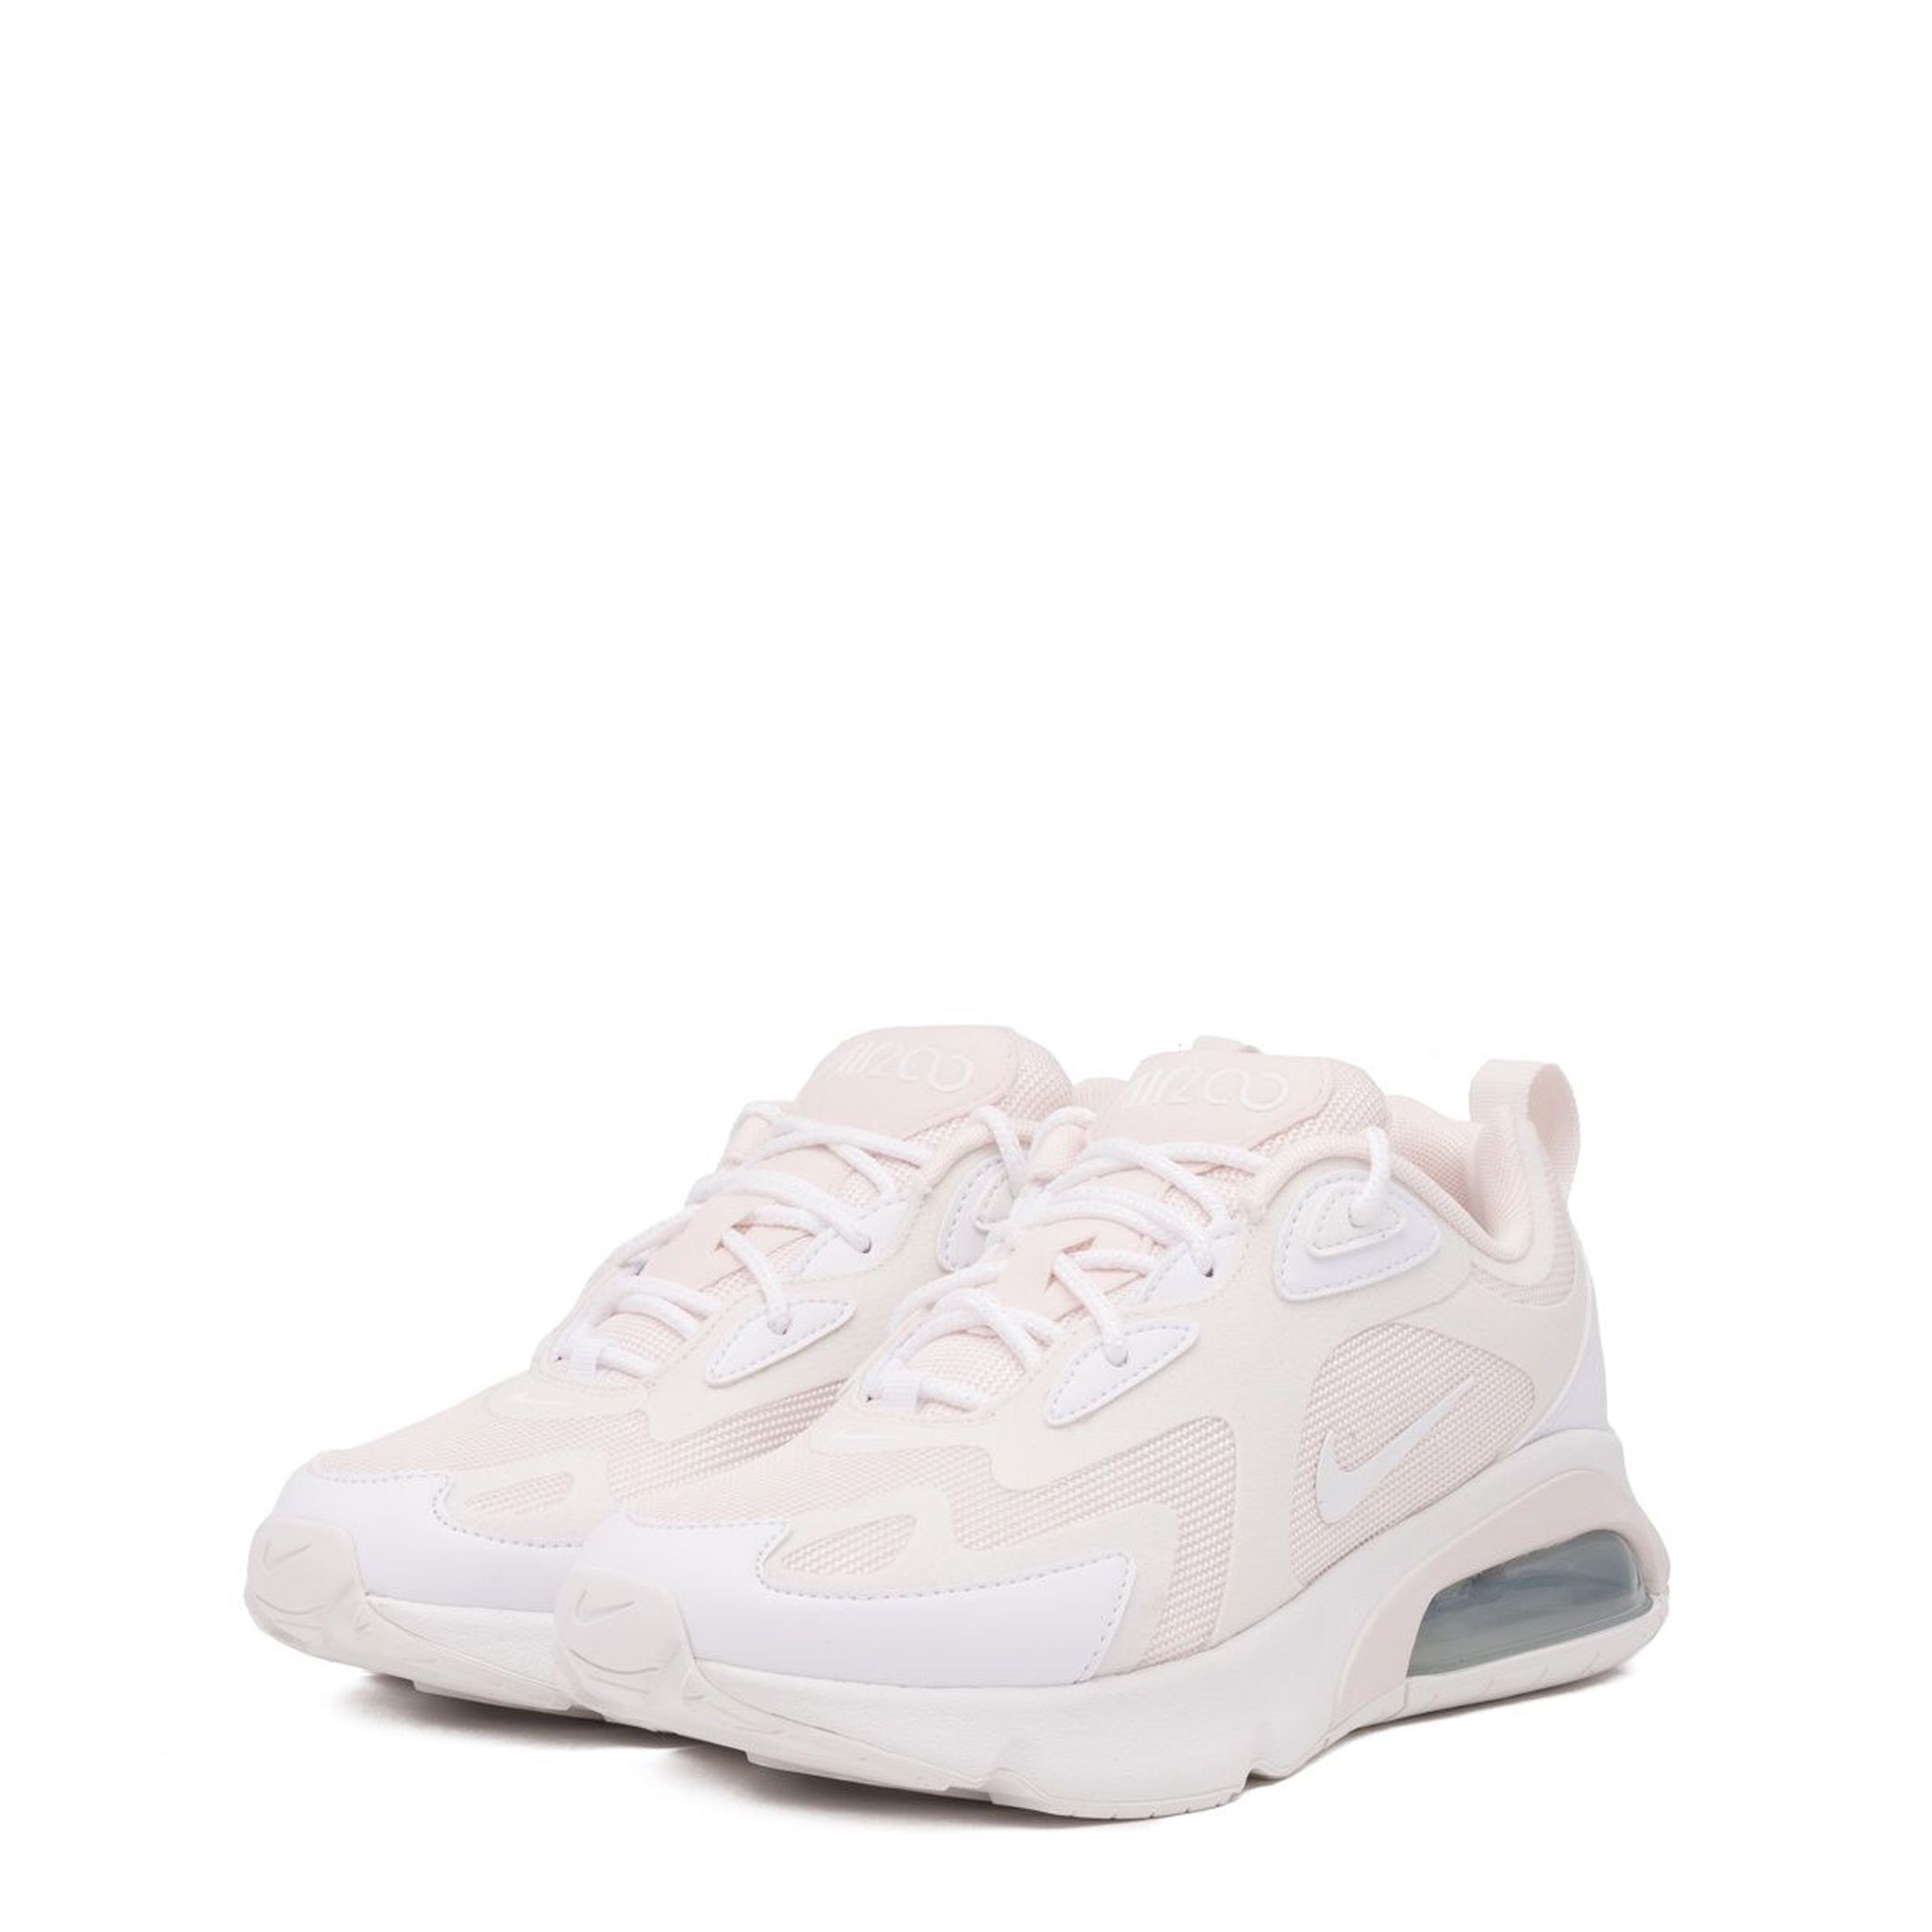 Sneakers Nike – AirMax200